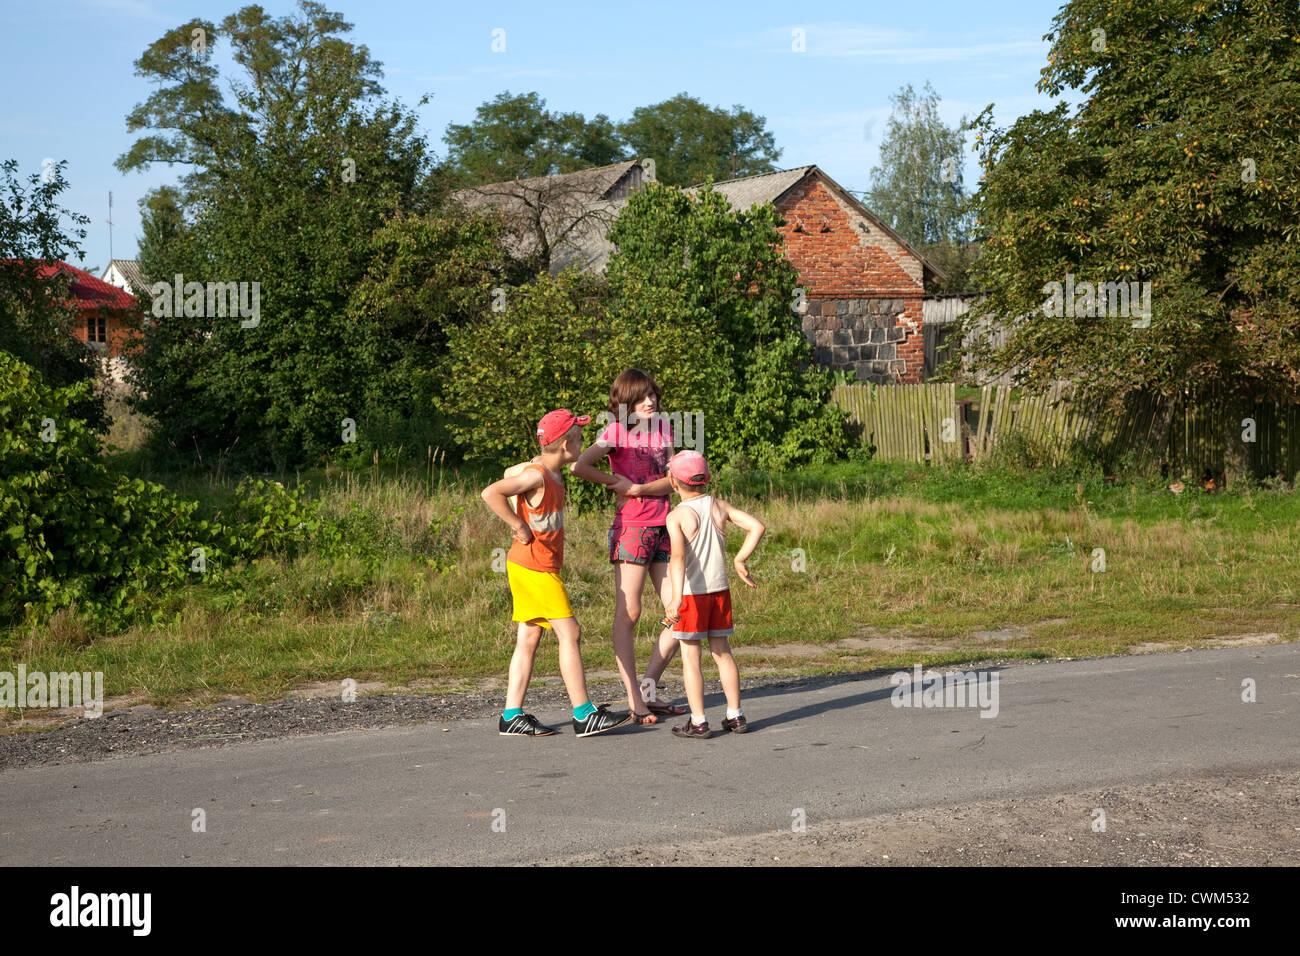 Polish children talking on village road. Mala Wola Central Poland - Stock Image